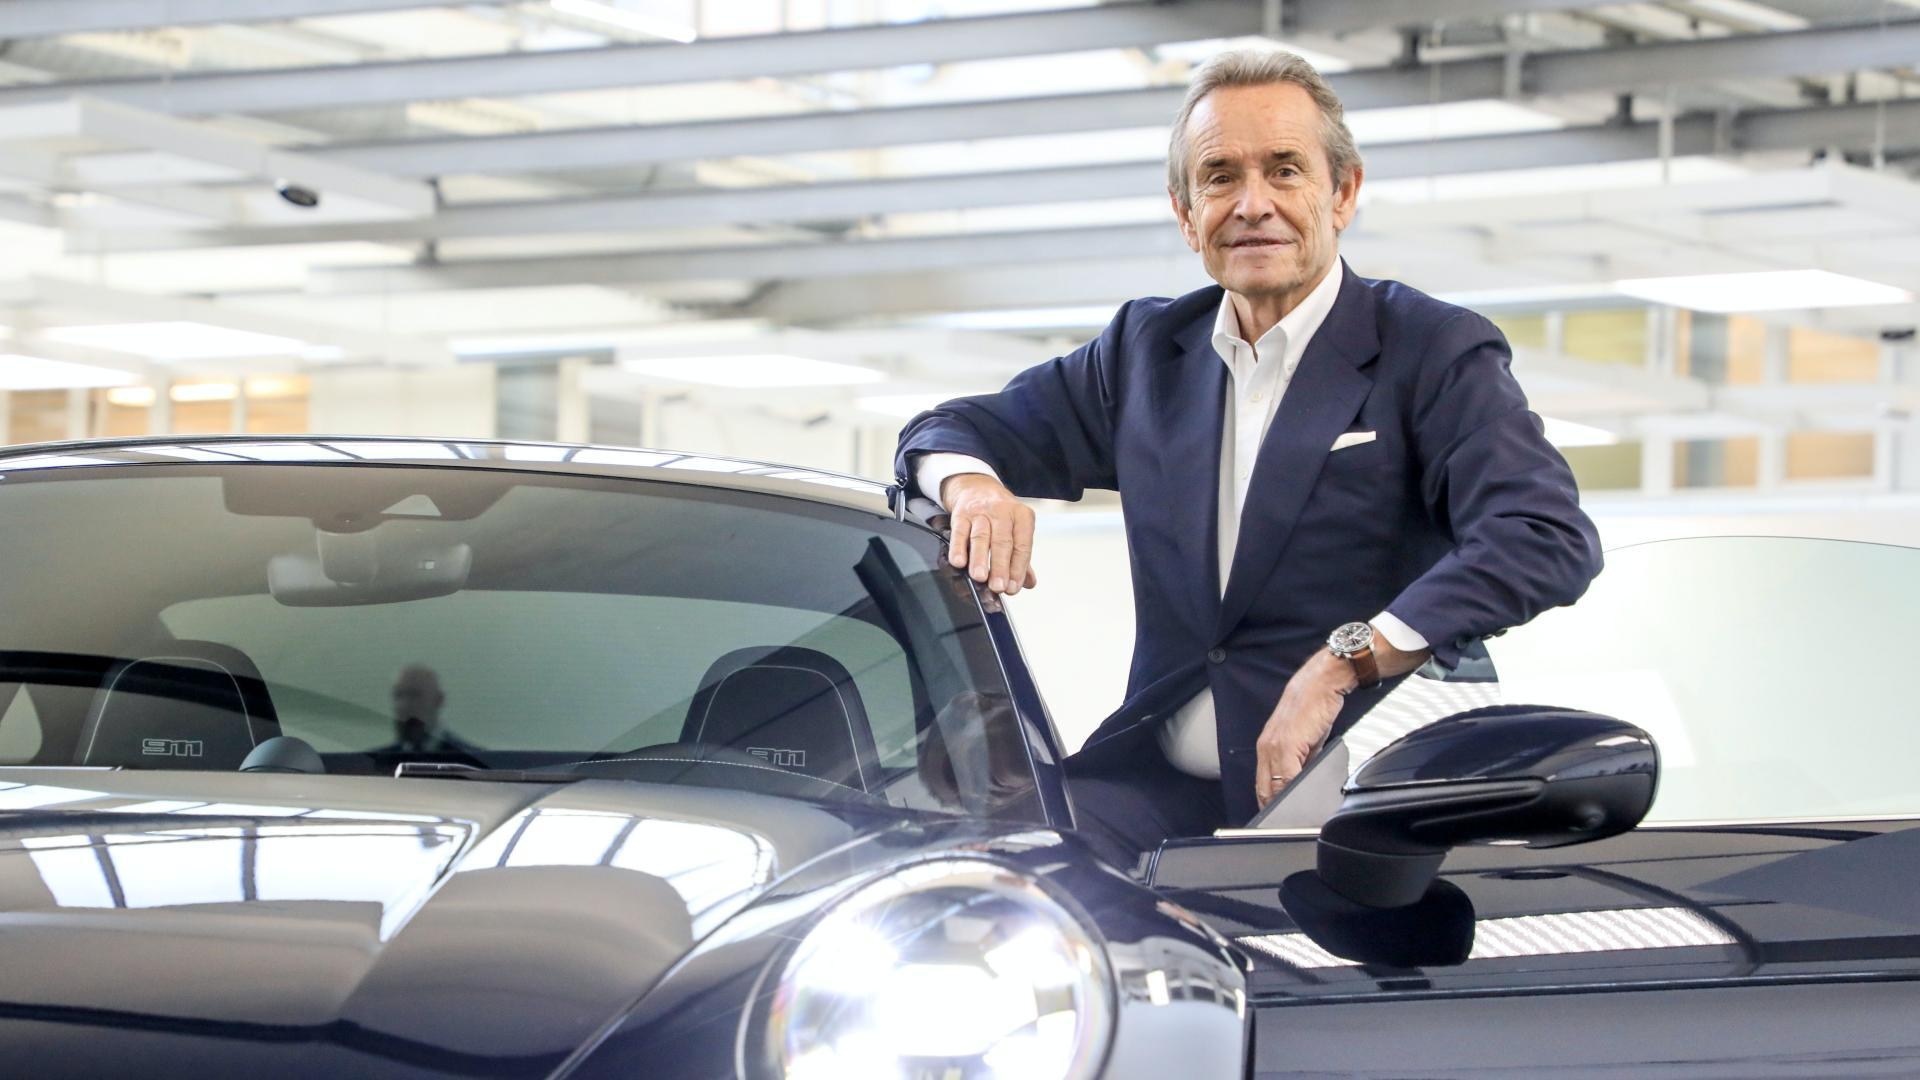 Porsche-911-Belgian-Legend-Edition-2020-Jacky-Ickx-3